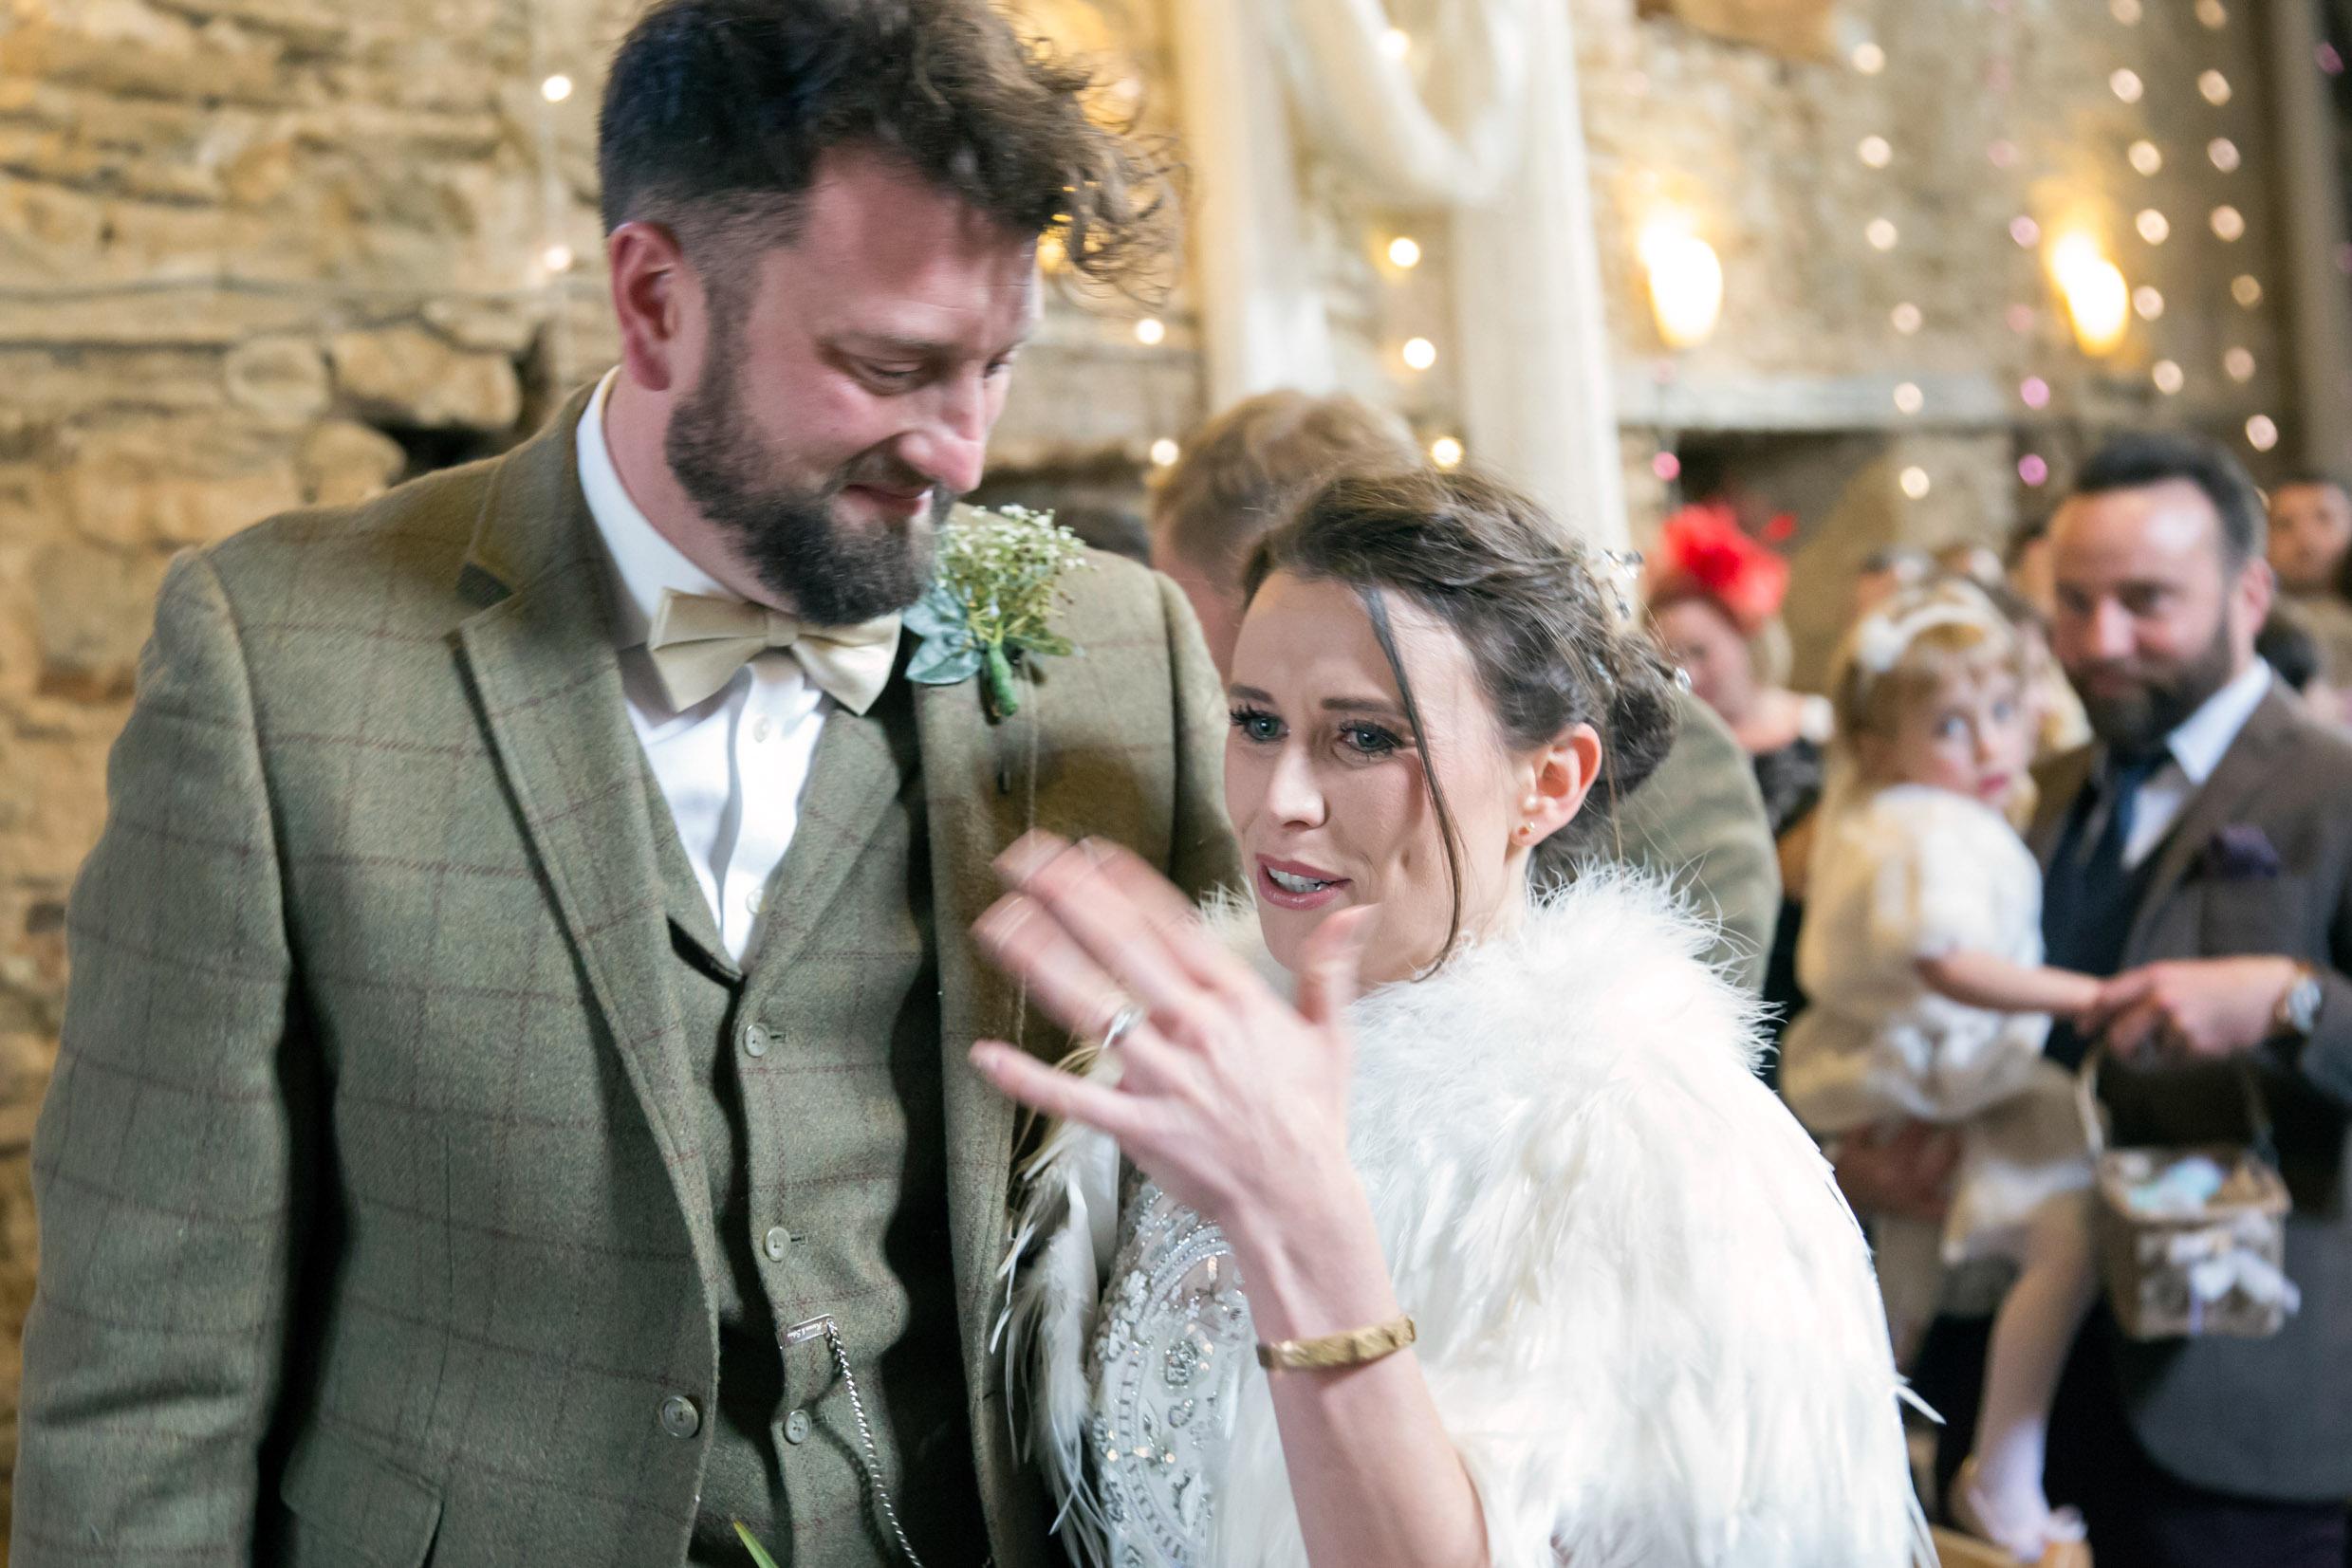 Jess & Ben - Bristol Wedding Photographer - Wright Wedding Photography - 63